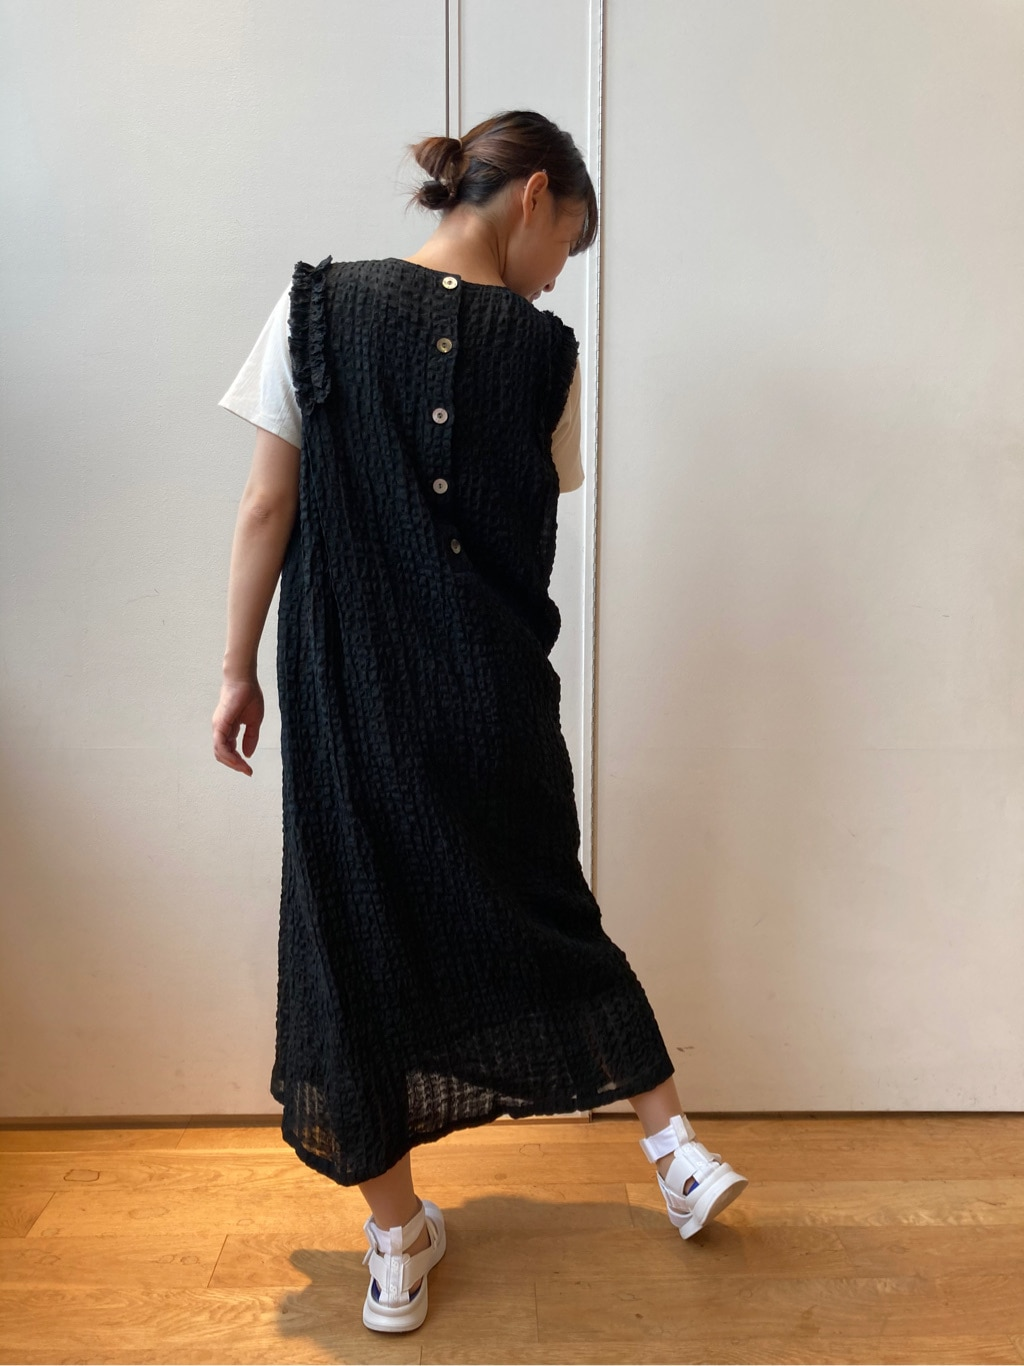 bulle de savon KITTE丸の内 身長:159cm 2020.07.07